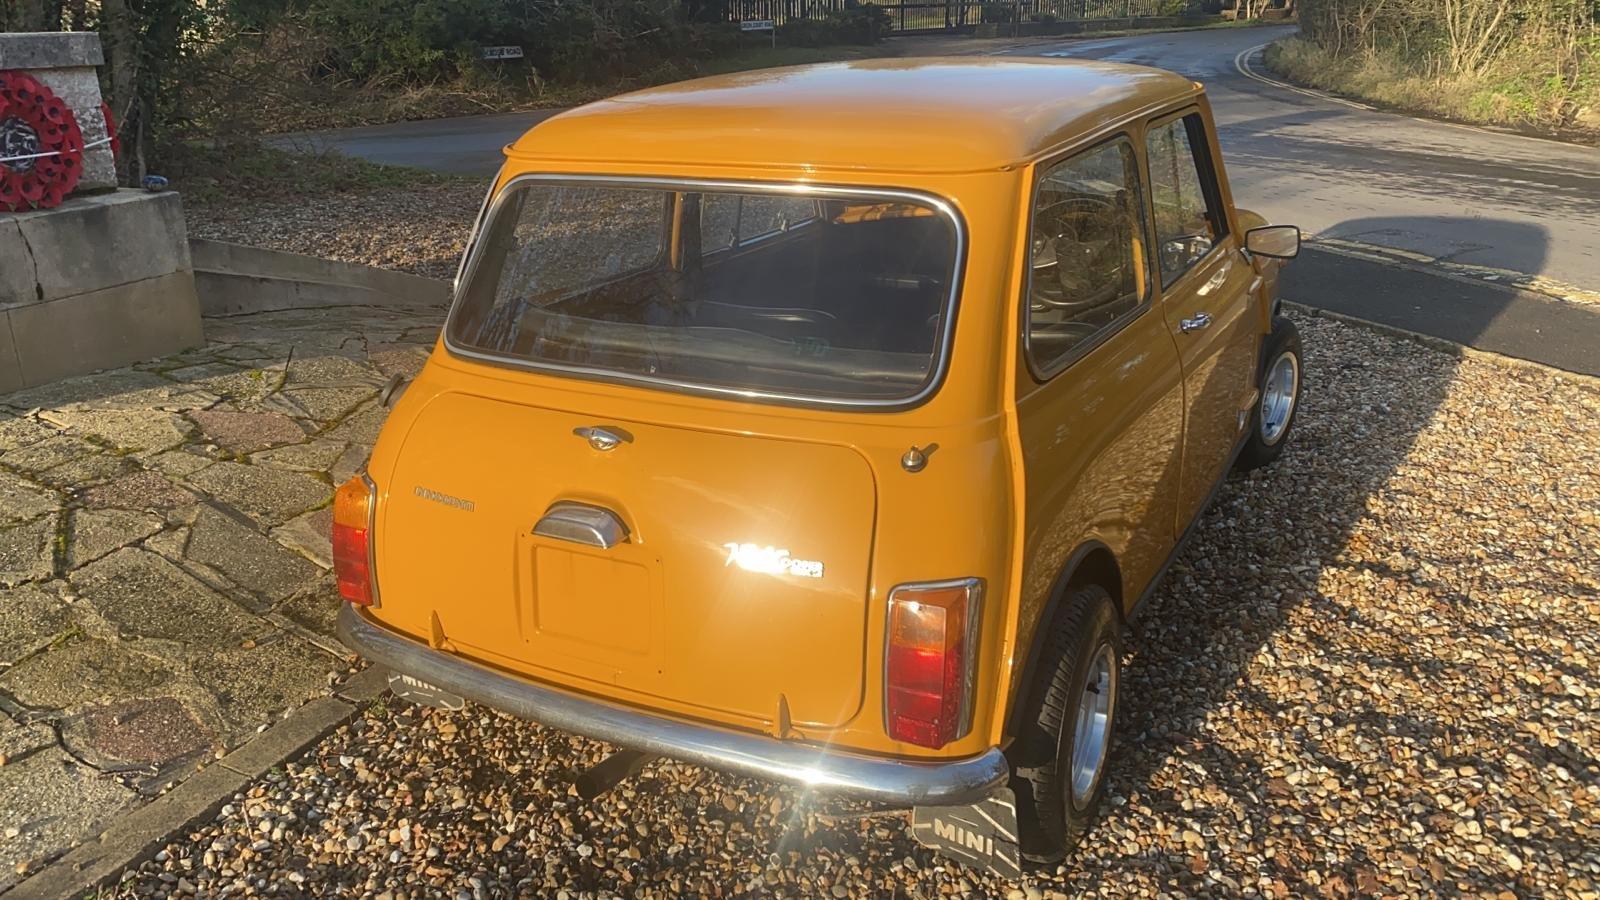 1968 Stunning Mini Innocenti For Sale (picture 4 of 12)